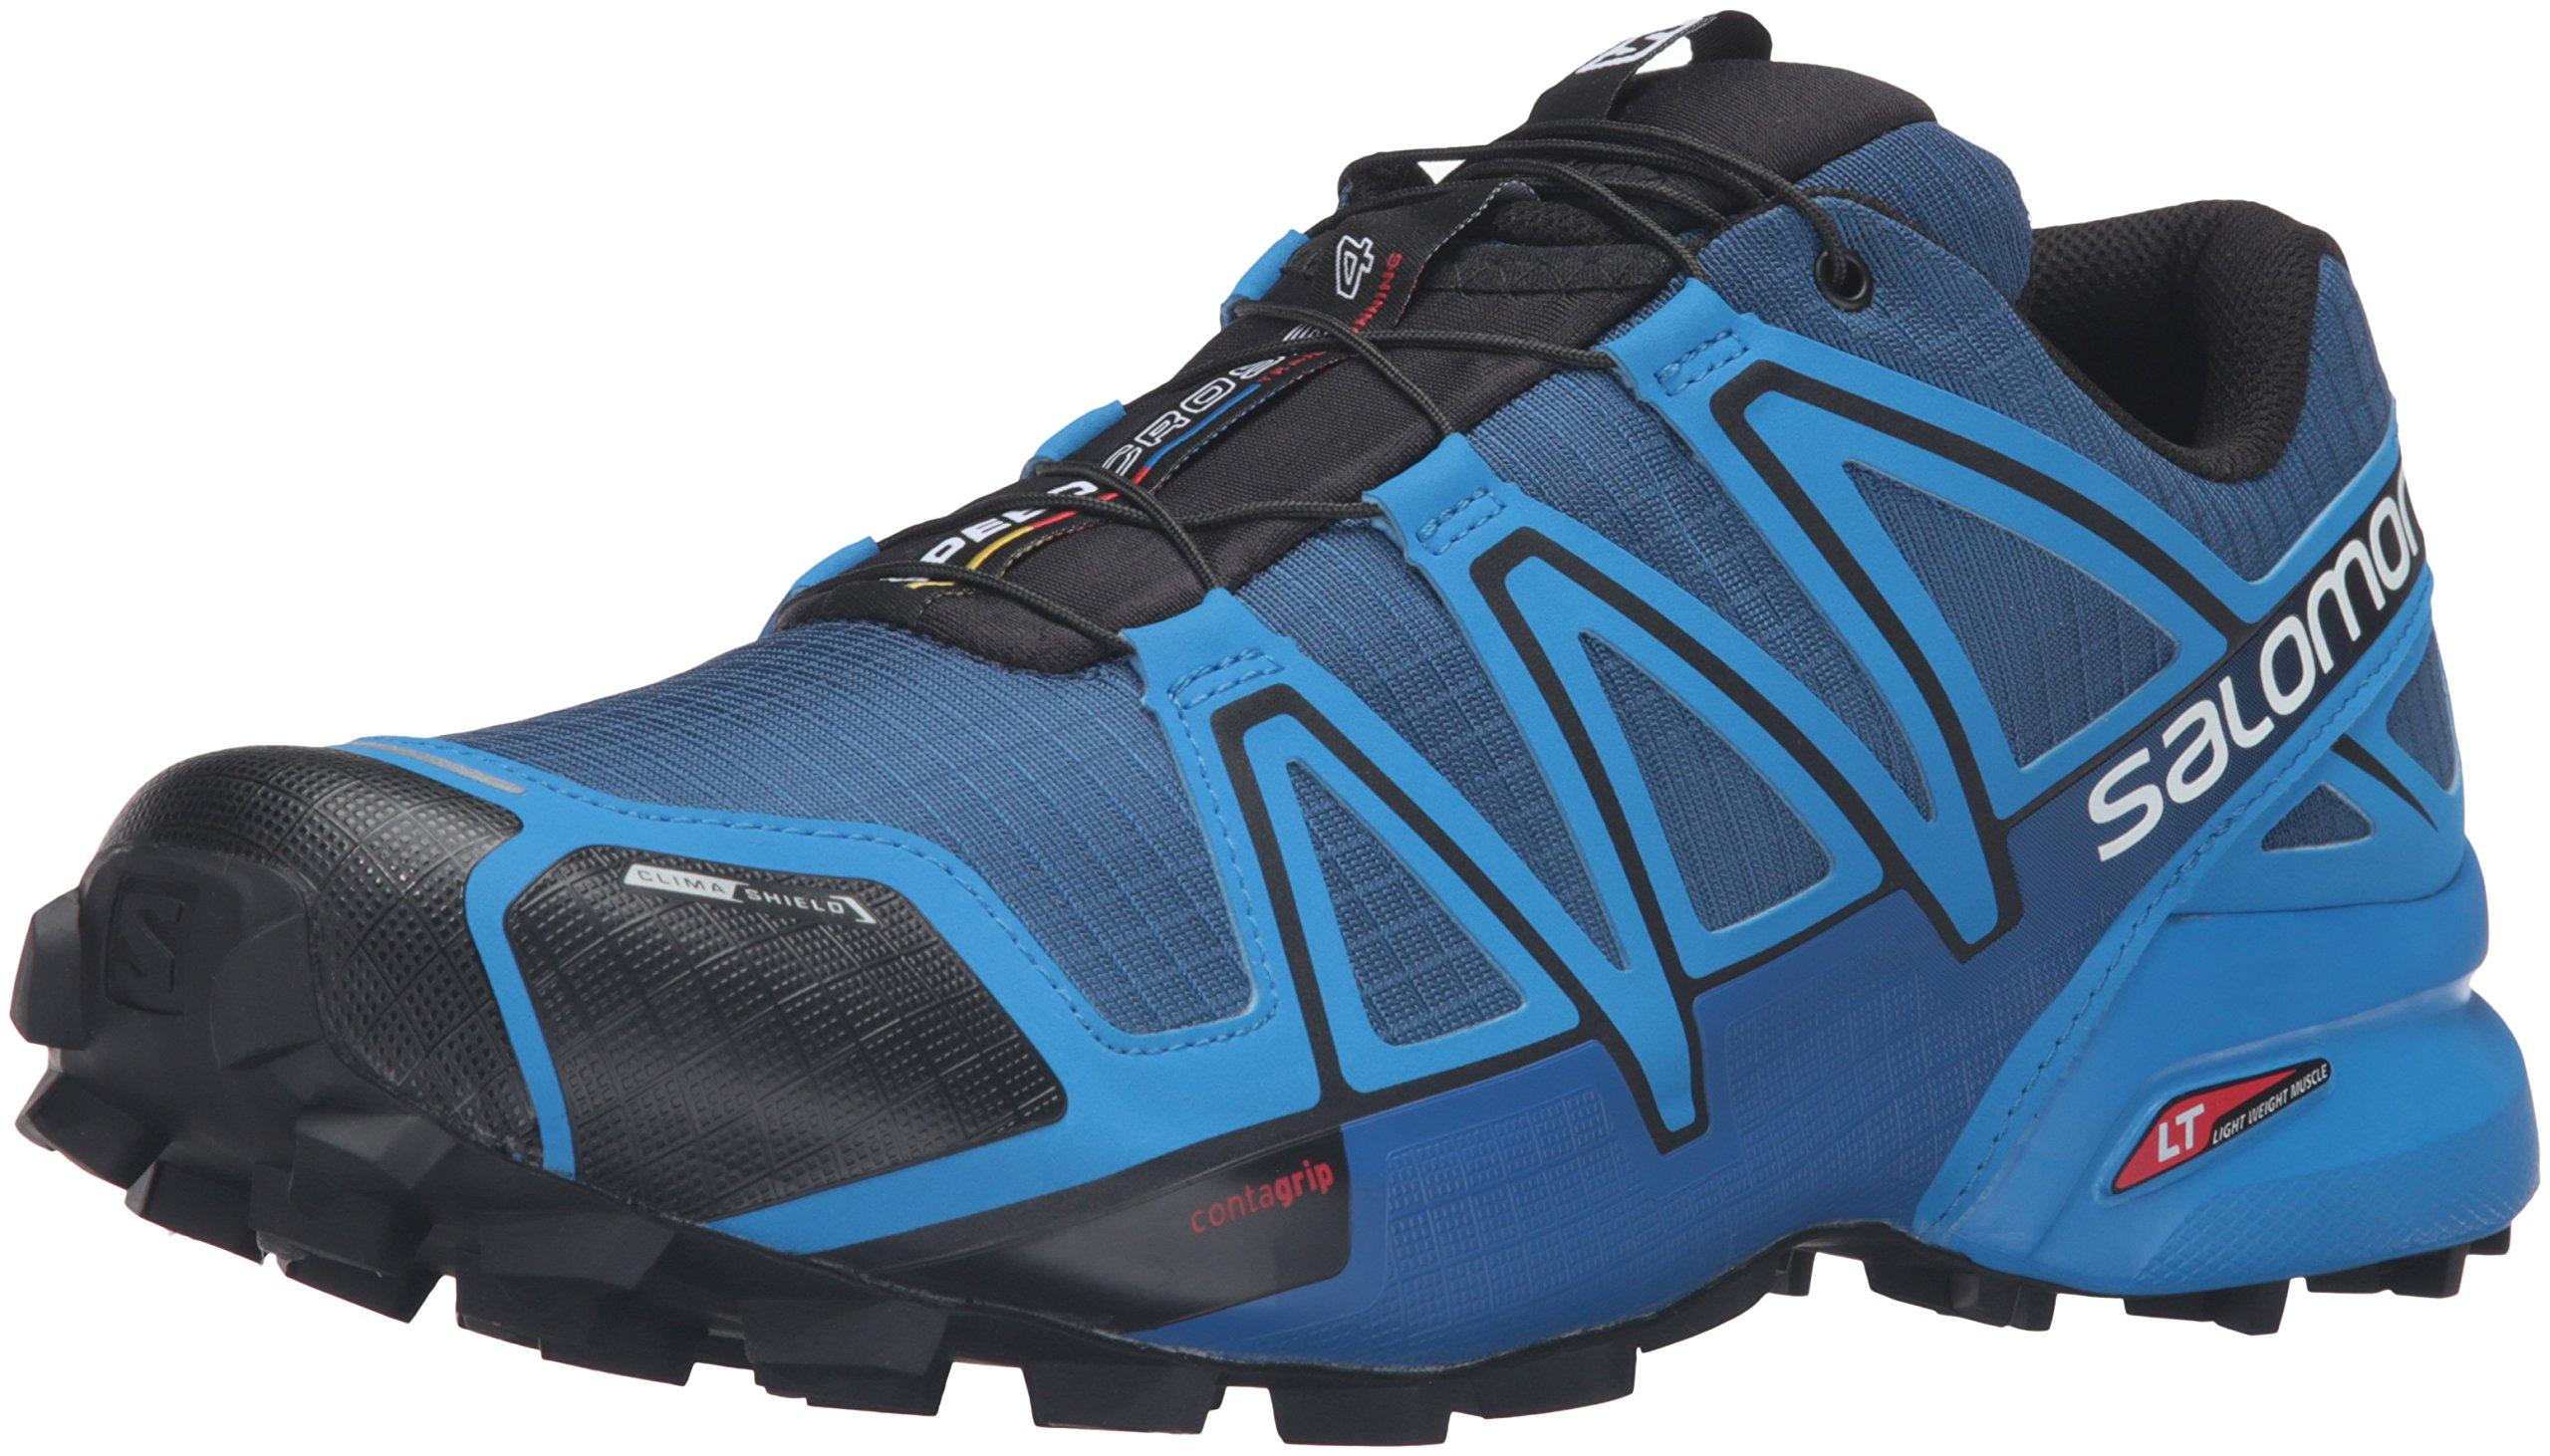 Salomon Men's XA Pro 3D Trail Running Shoes, Blue Depth/Bright Blue/Black, 8 D US